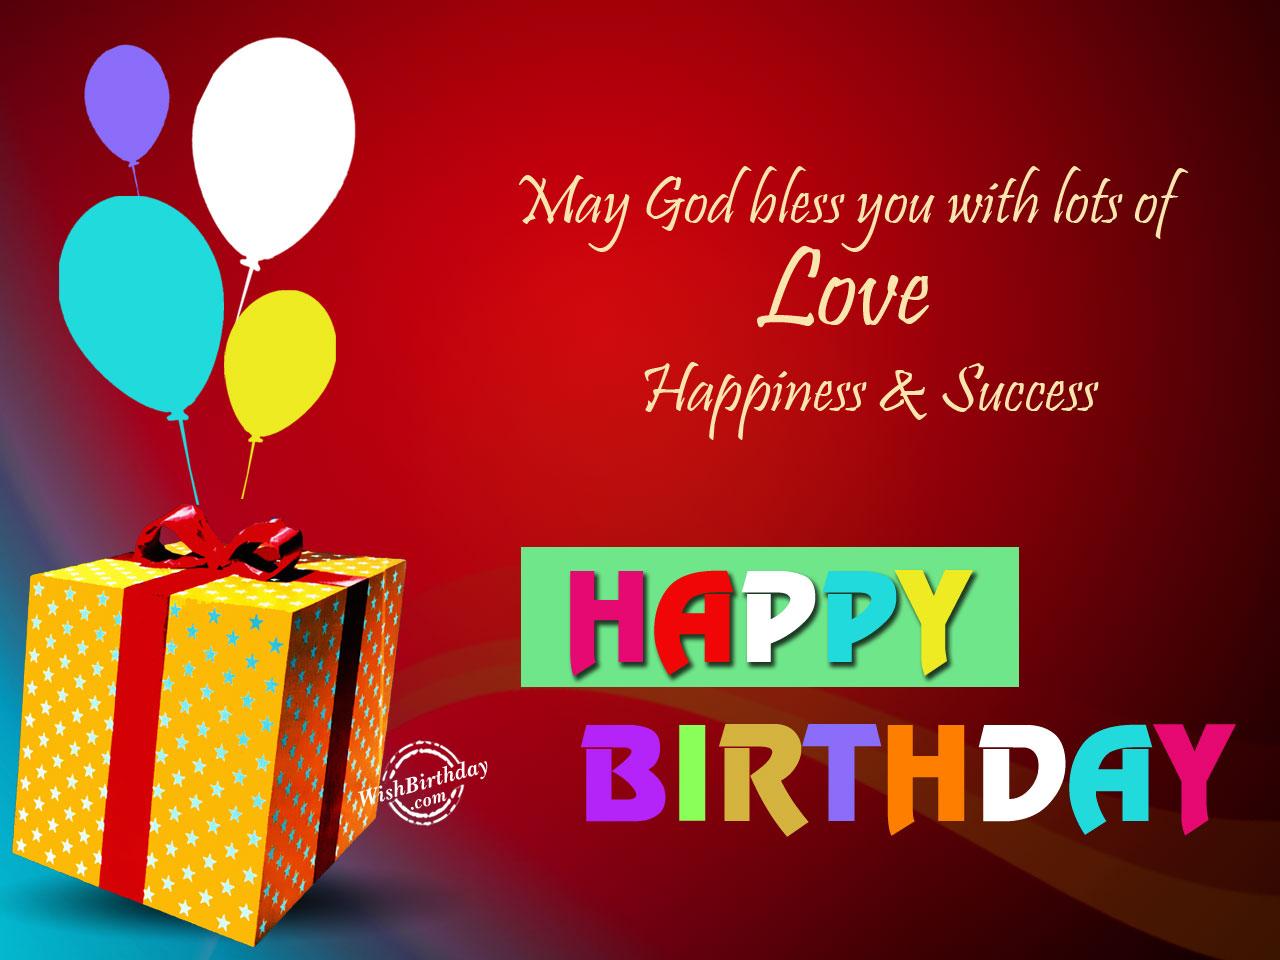 HAPPY BIRTHDAY TO YOU BY DR SEUSS . HC . 11 X 8 ... 1987